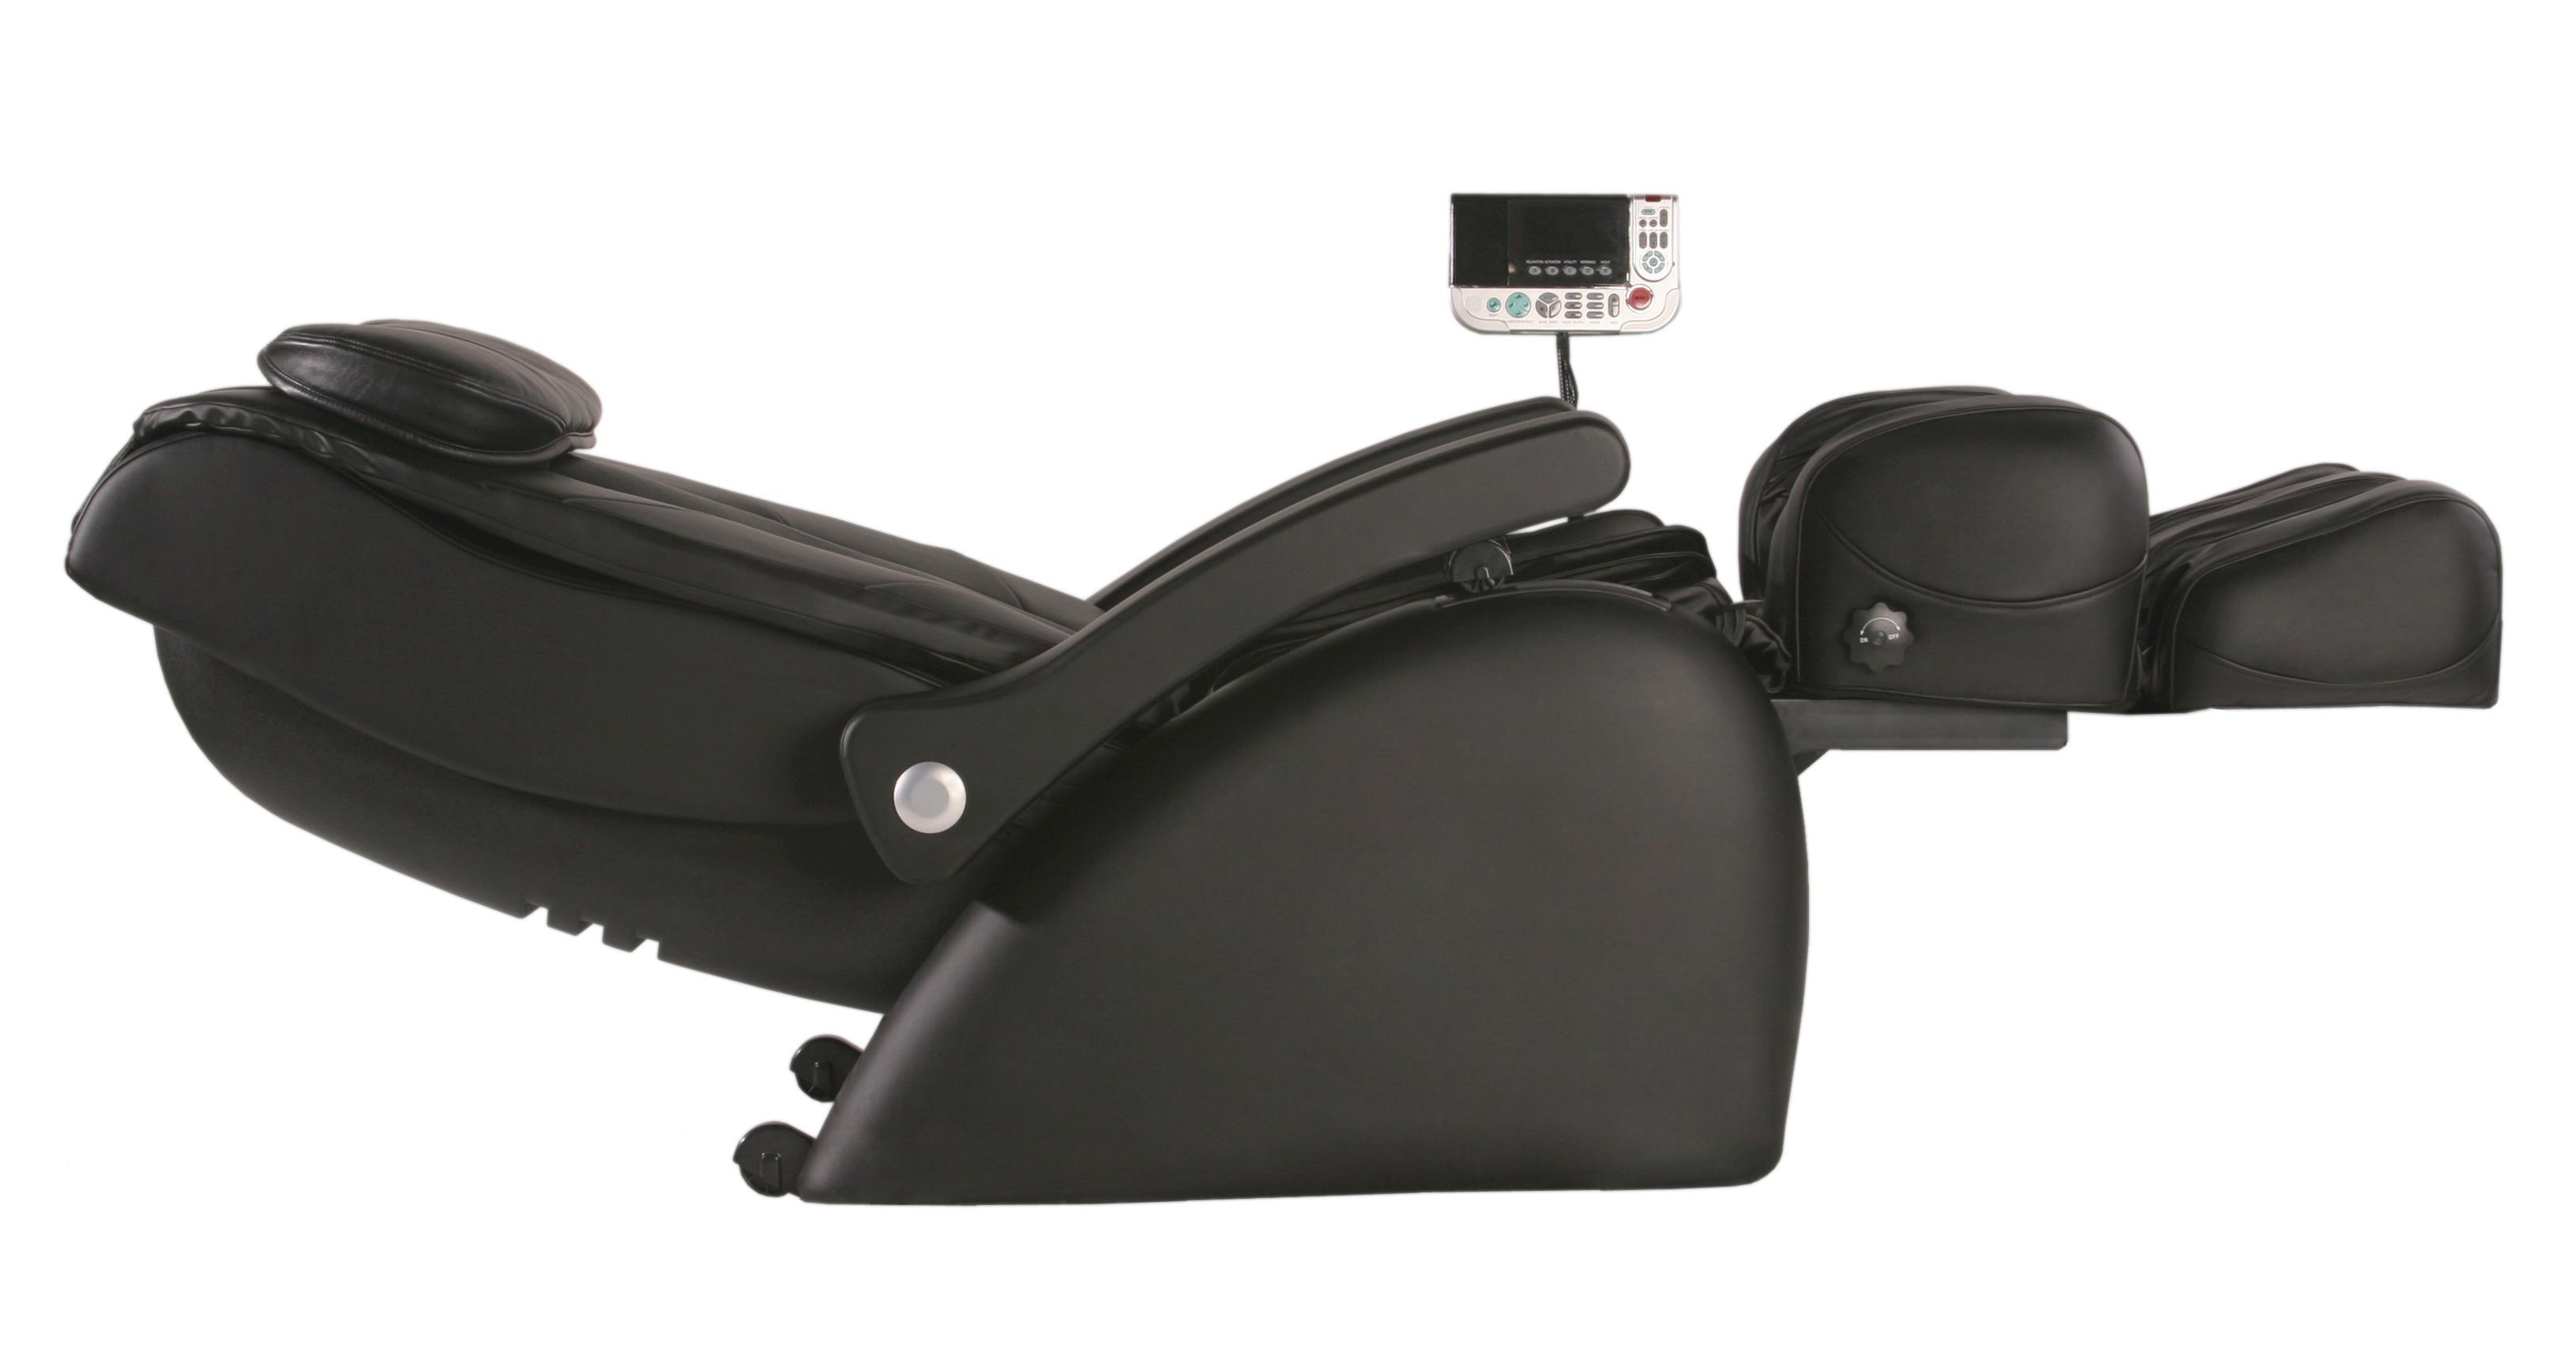 Omega Montage Premier Massage Chair with Arm Massage Recline